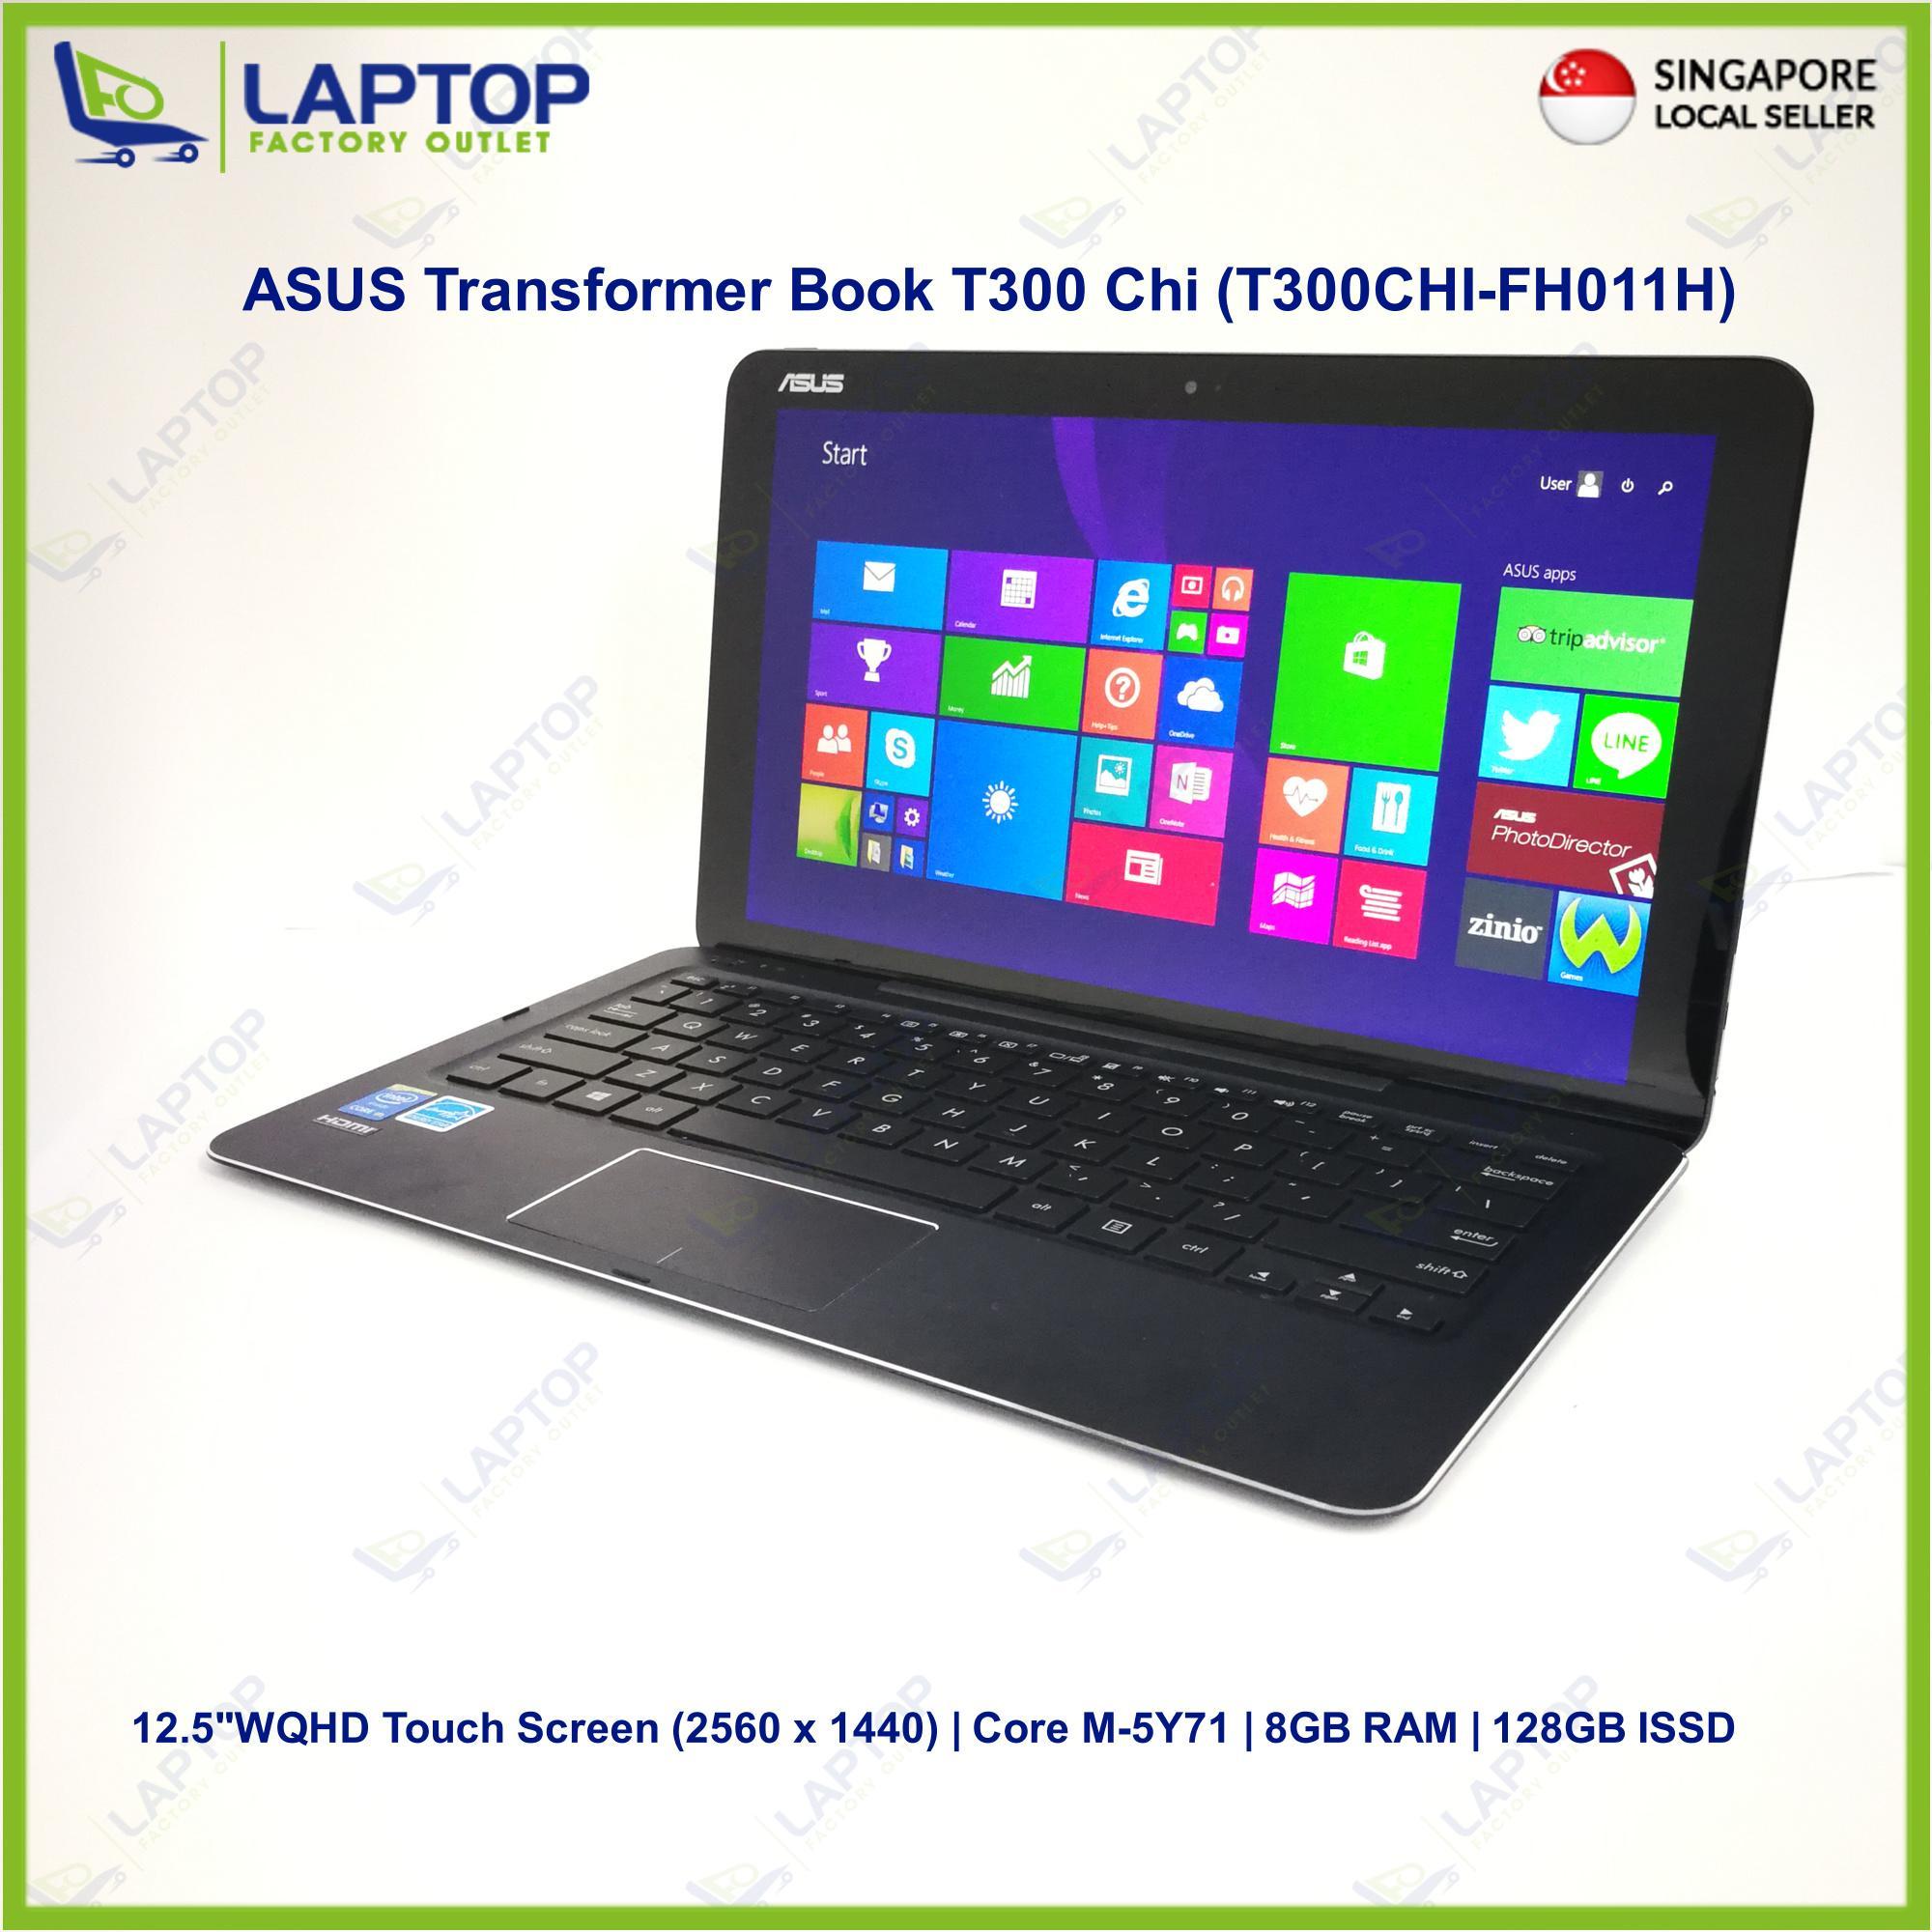 Buy 2 In 1 Laptops Online | Convertible | Lazada sg